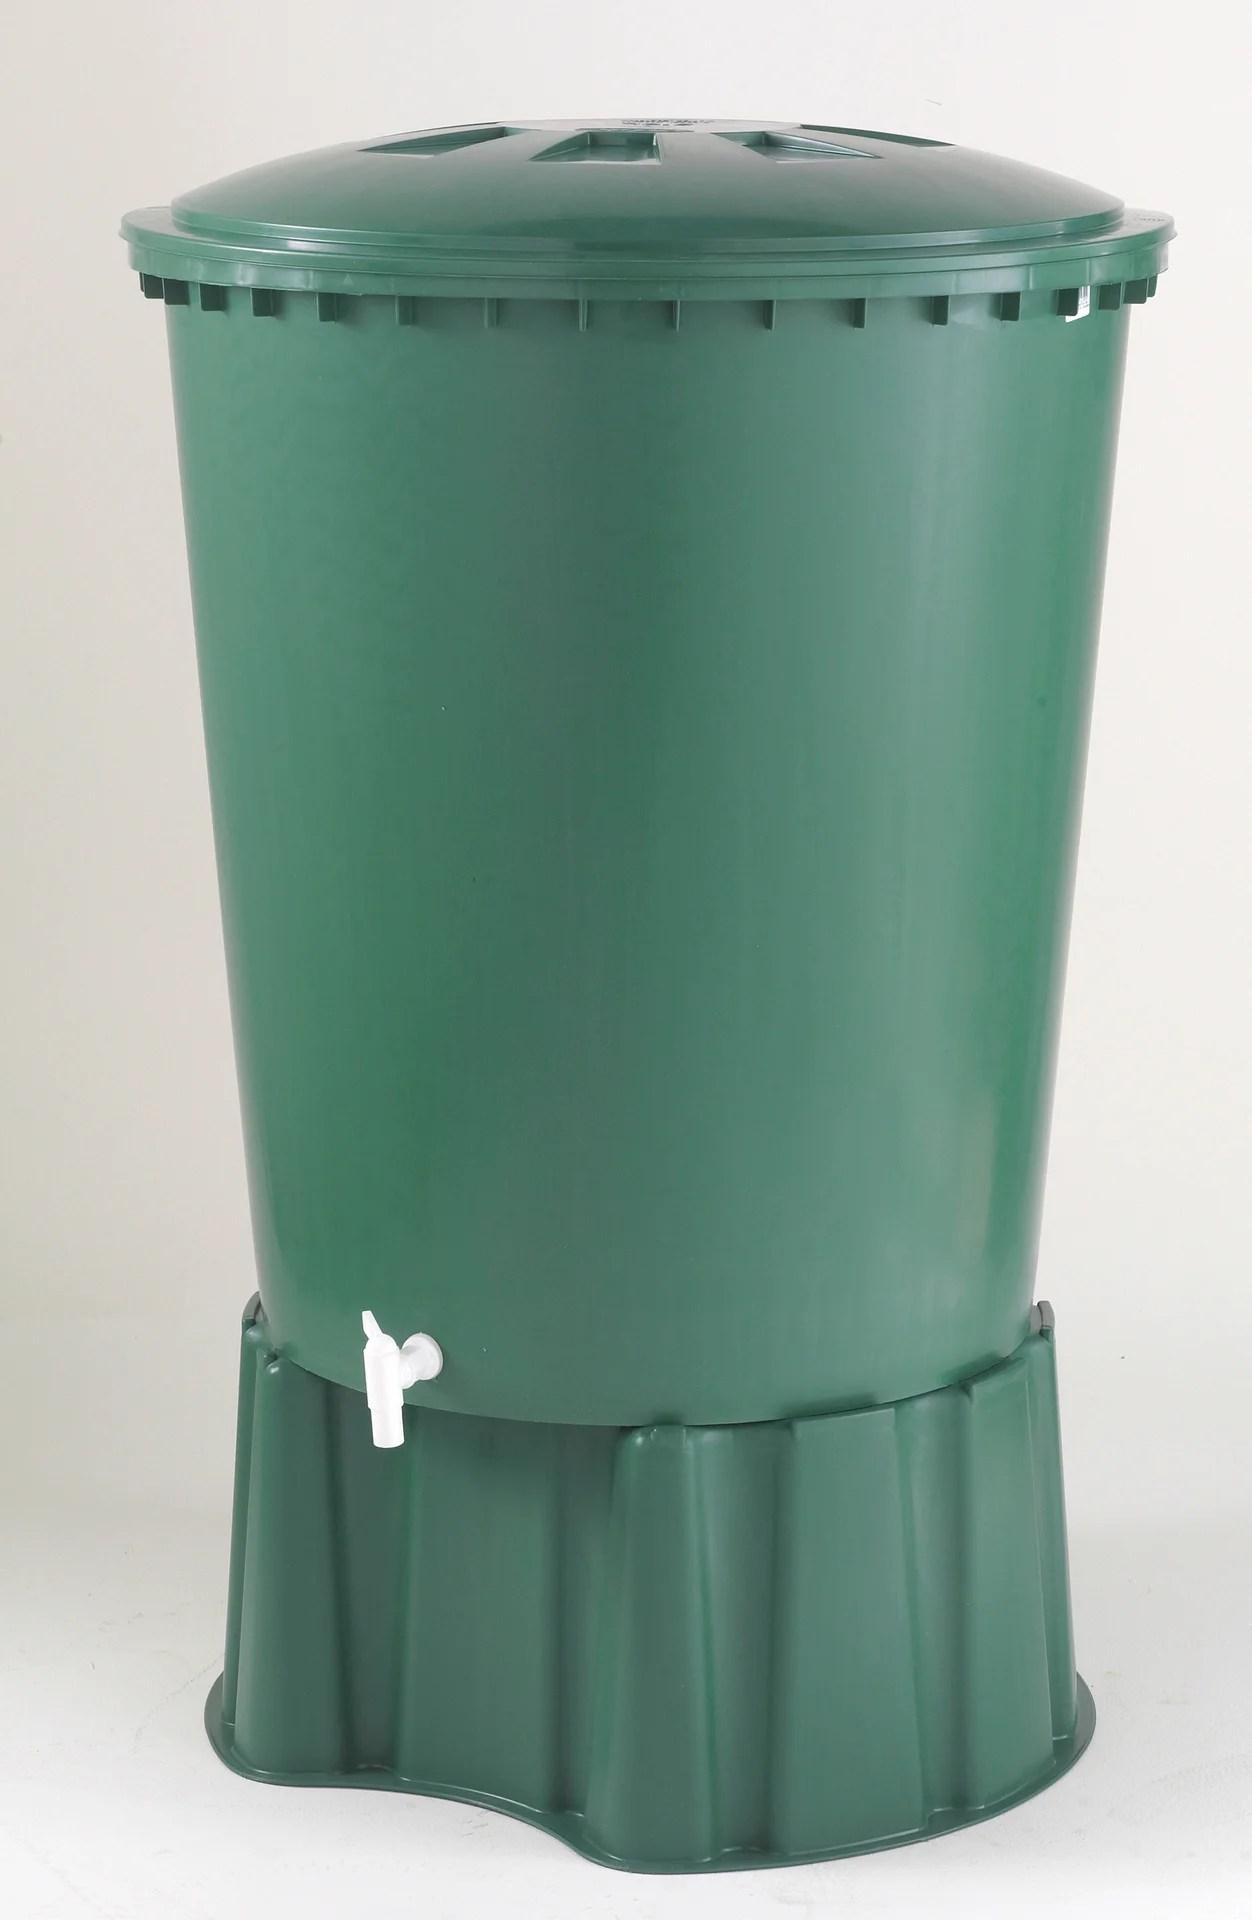 Recuperateur D Eau Aerien Garantia Cylindrique Vert 310 L Leroy Merlin